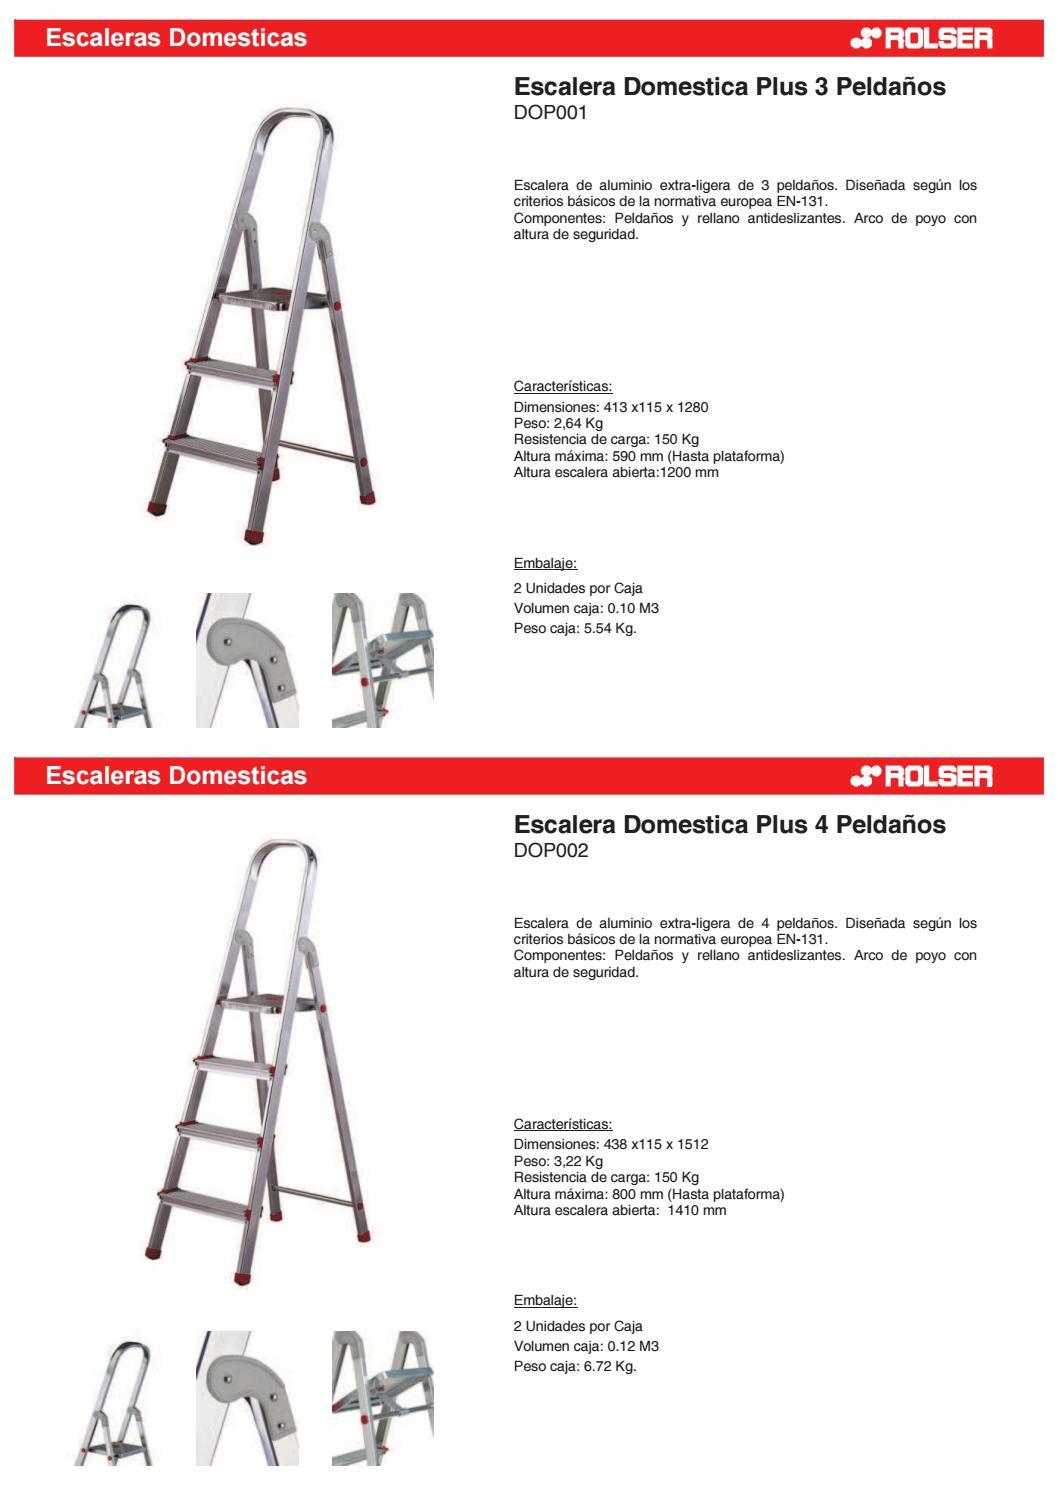 Rolser catalogo escaleras domestica plus by libef issuu for Escalera rolser 3 peldanos